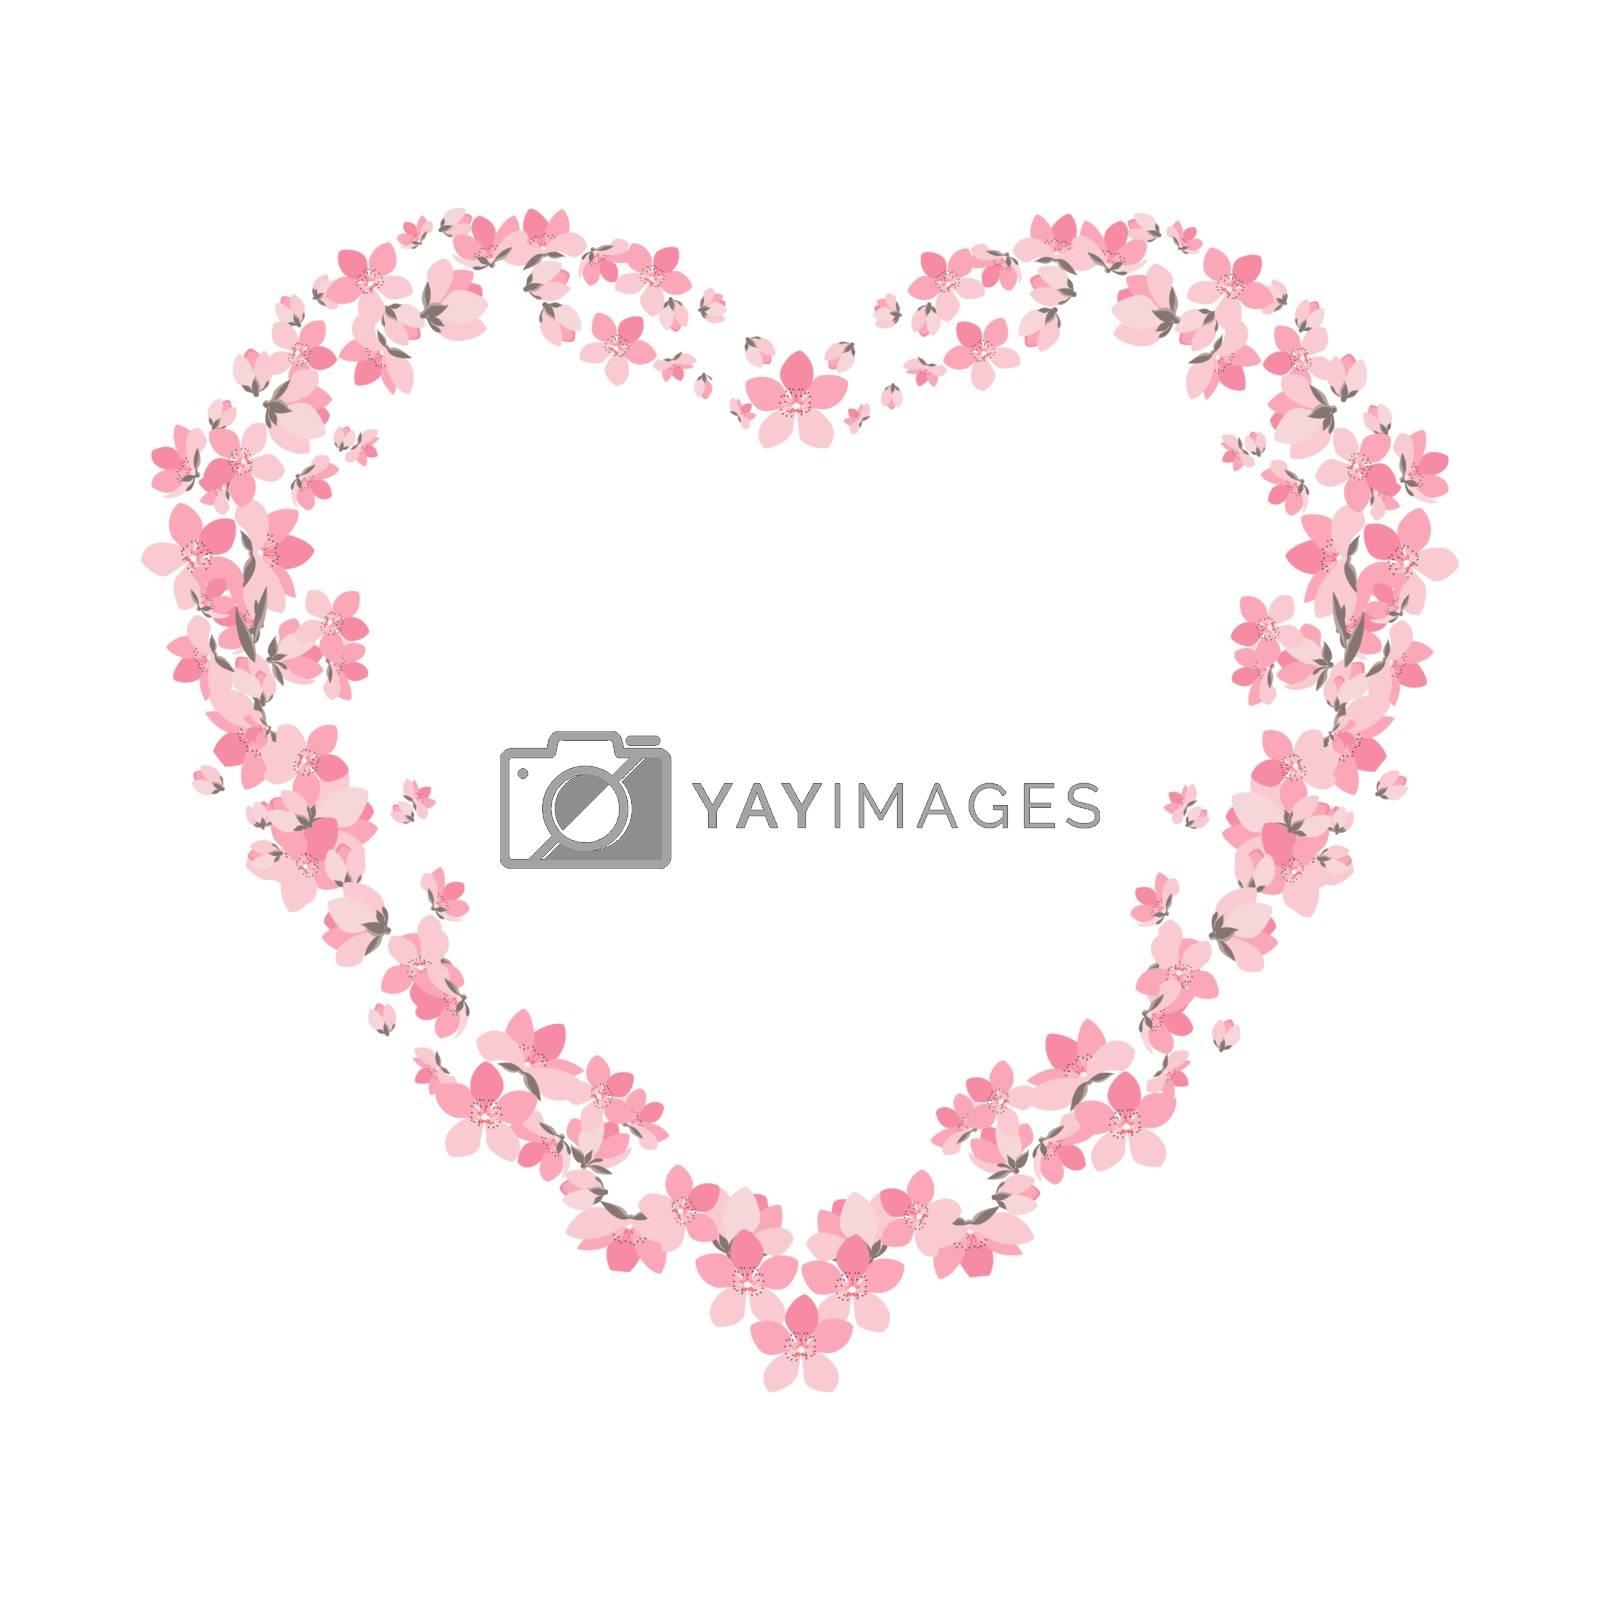 Vector illustration of a flower shaped heart. Flower decoration of sakura